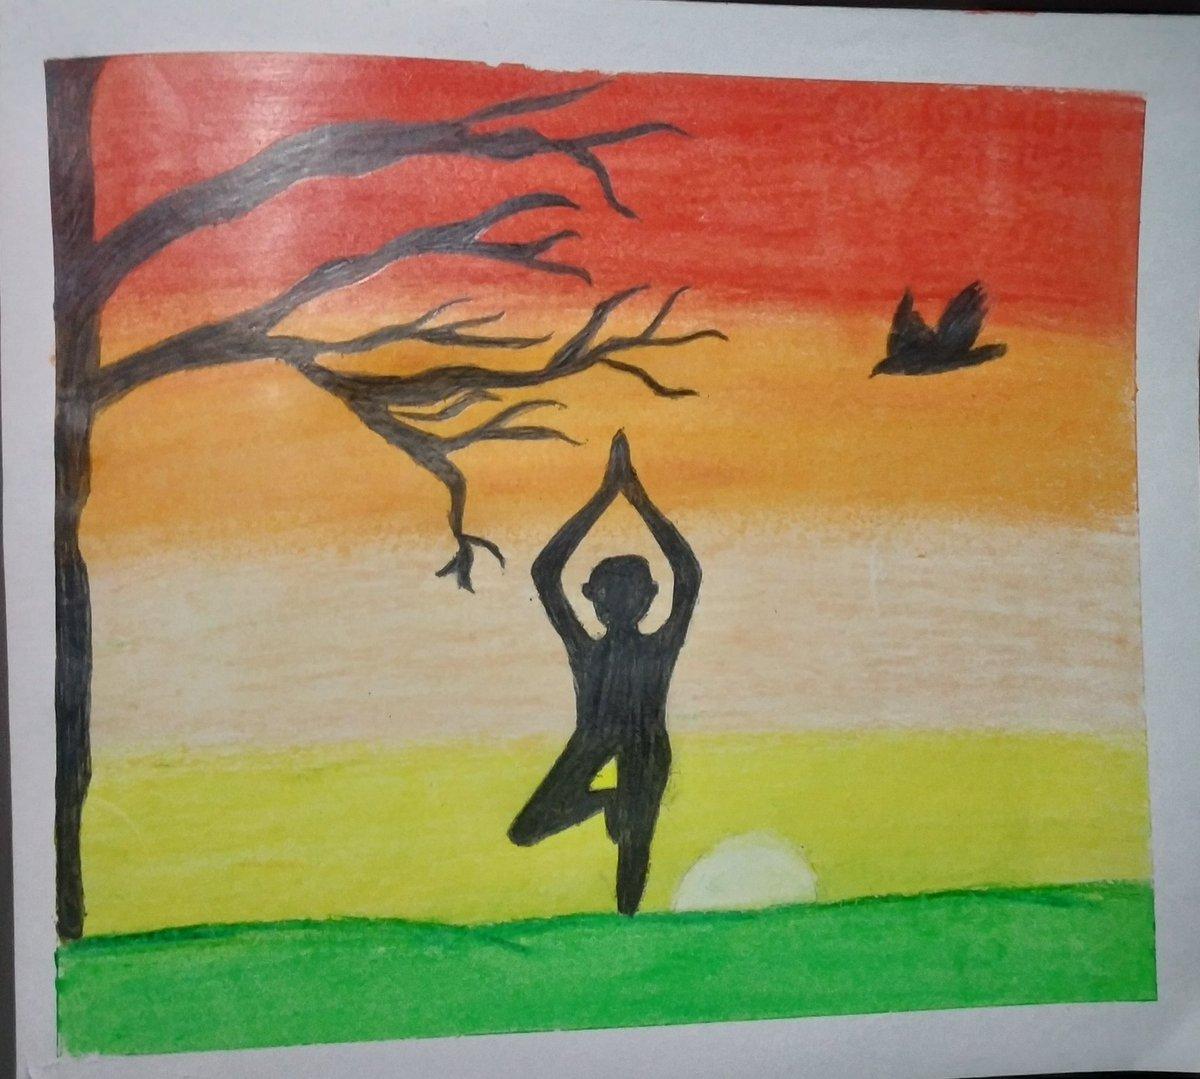 Shikha Bandral On Twitter Happy International Yoga Day To All Internationalyogaday2020